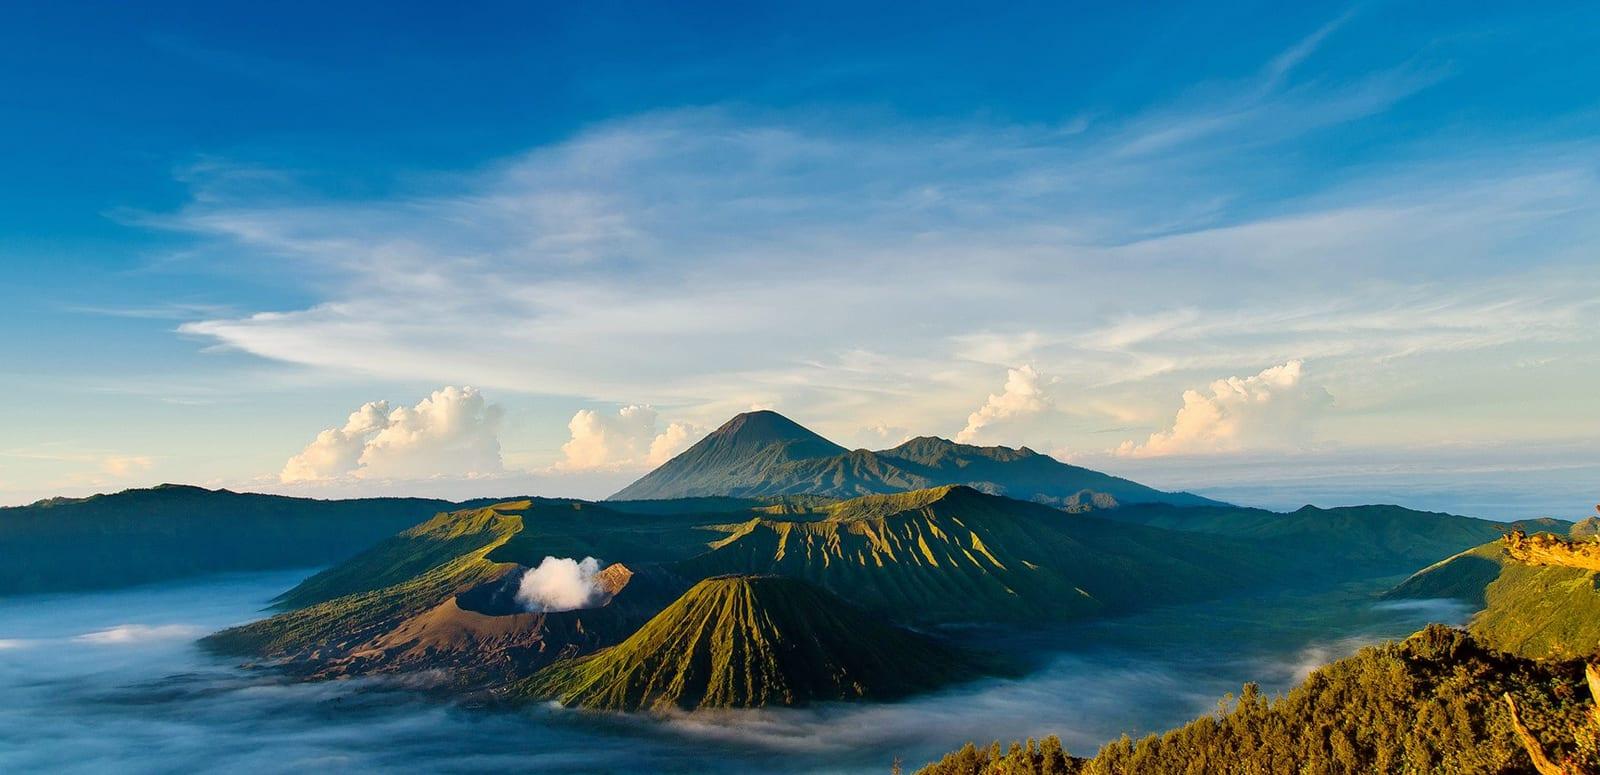 1491999085_java-indonesia-2048x1152-wallpaper.jpg